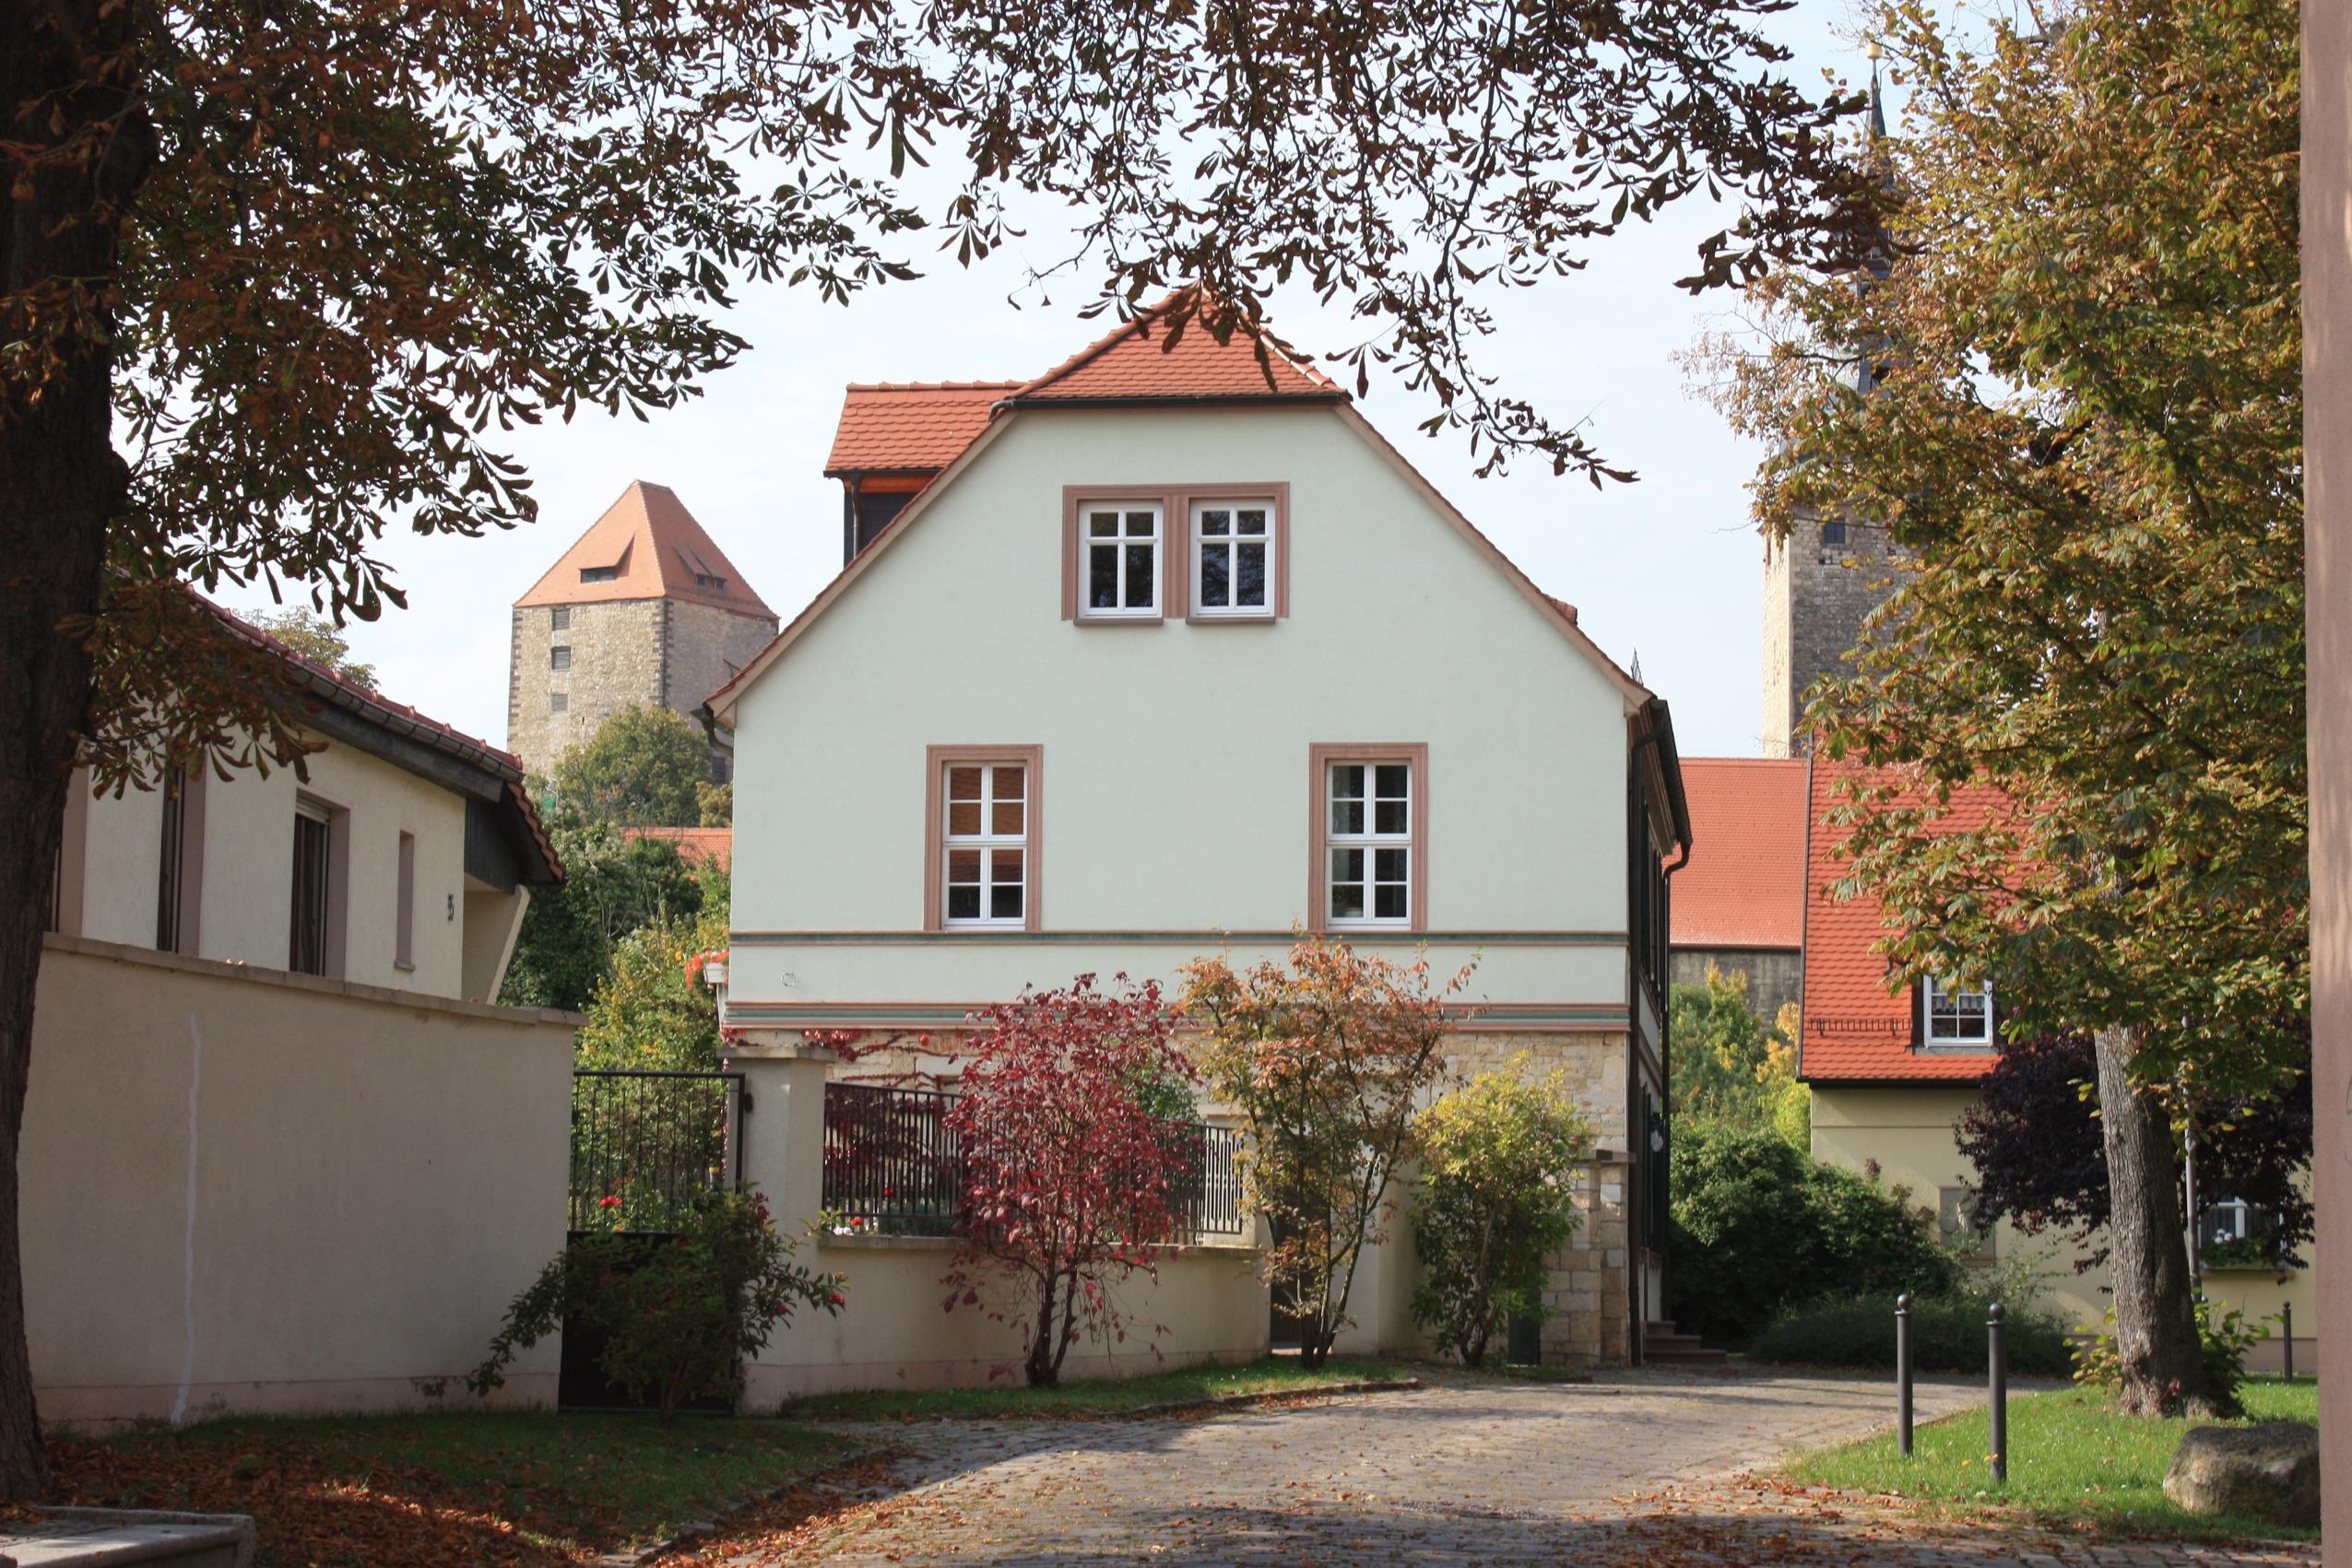 File:Querfurt, Haus Kirchplan 3.jpg Wikimedia Commons